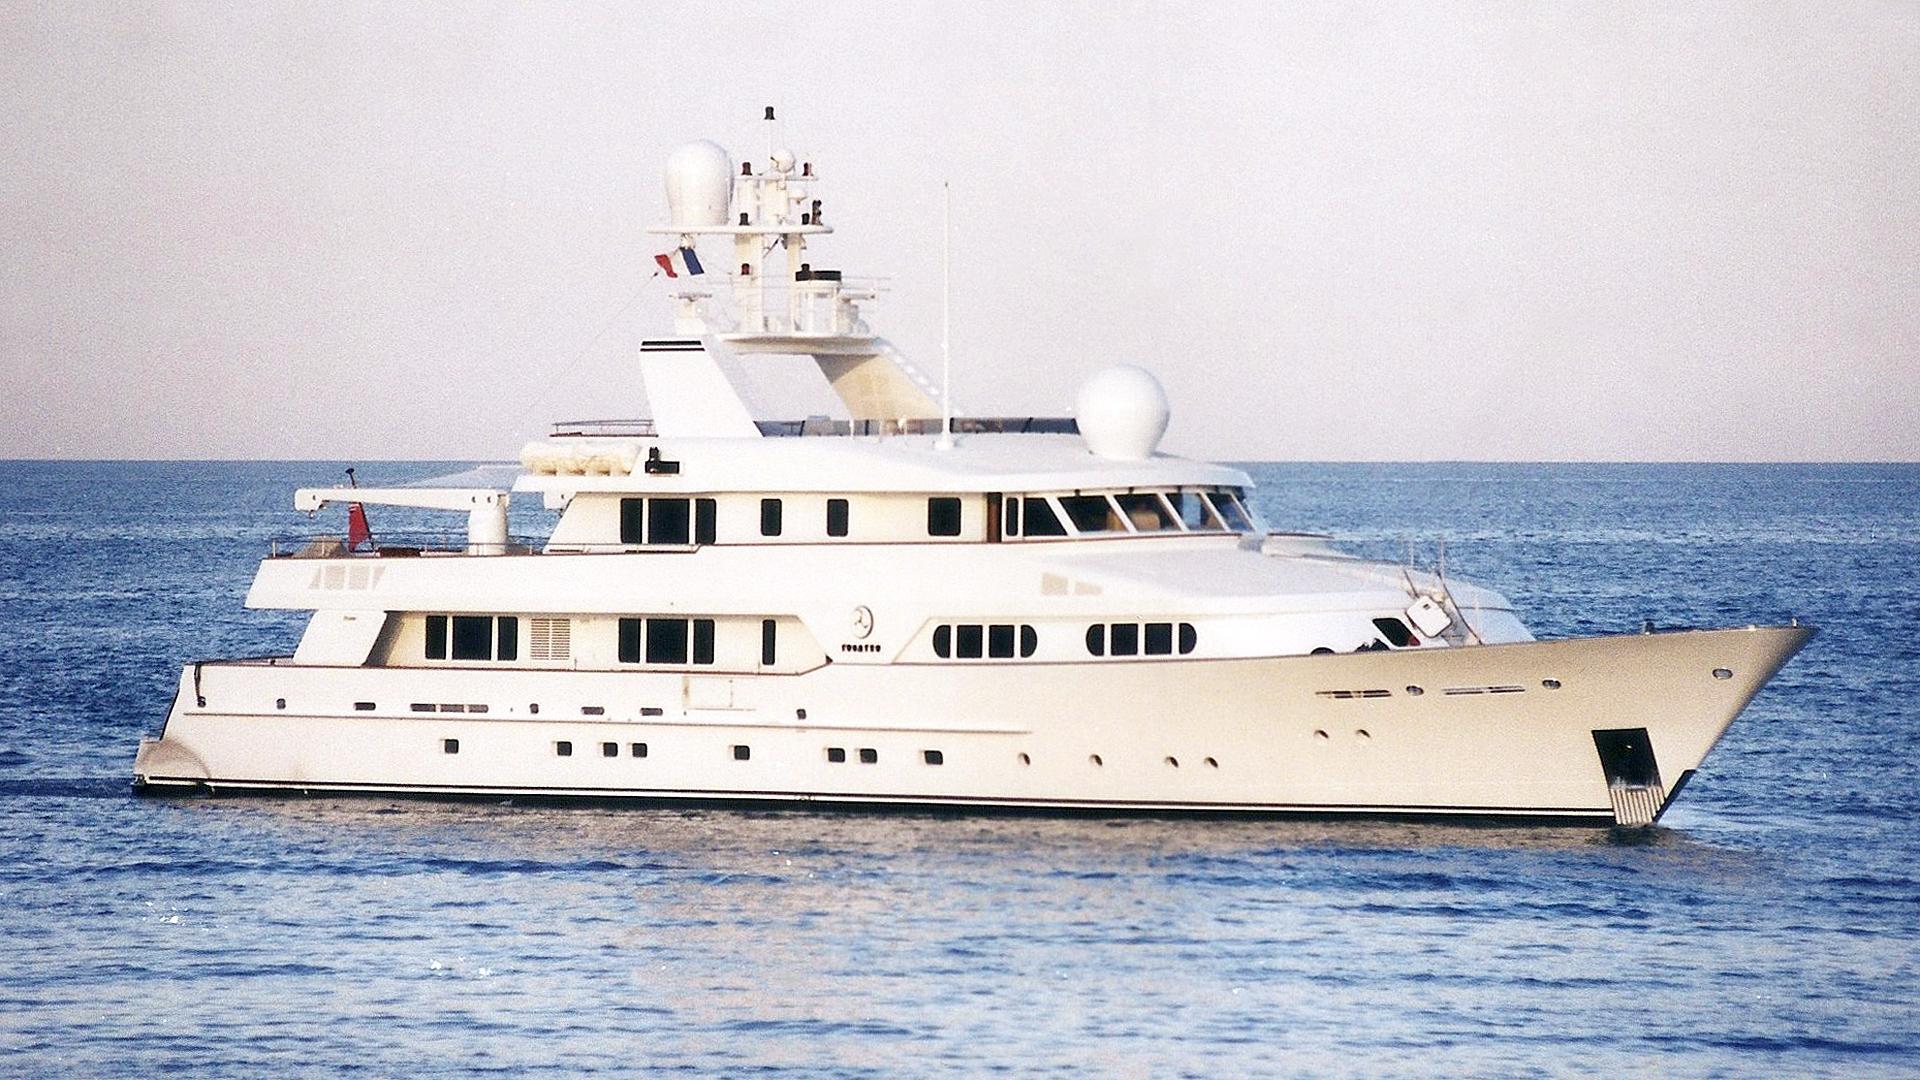 tugatsu-motor-yacht-feadhsip-1989-45m-before-refit